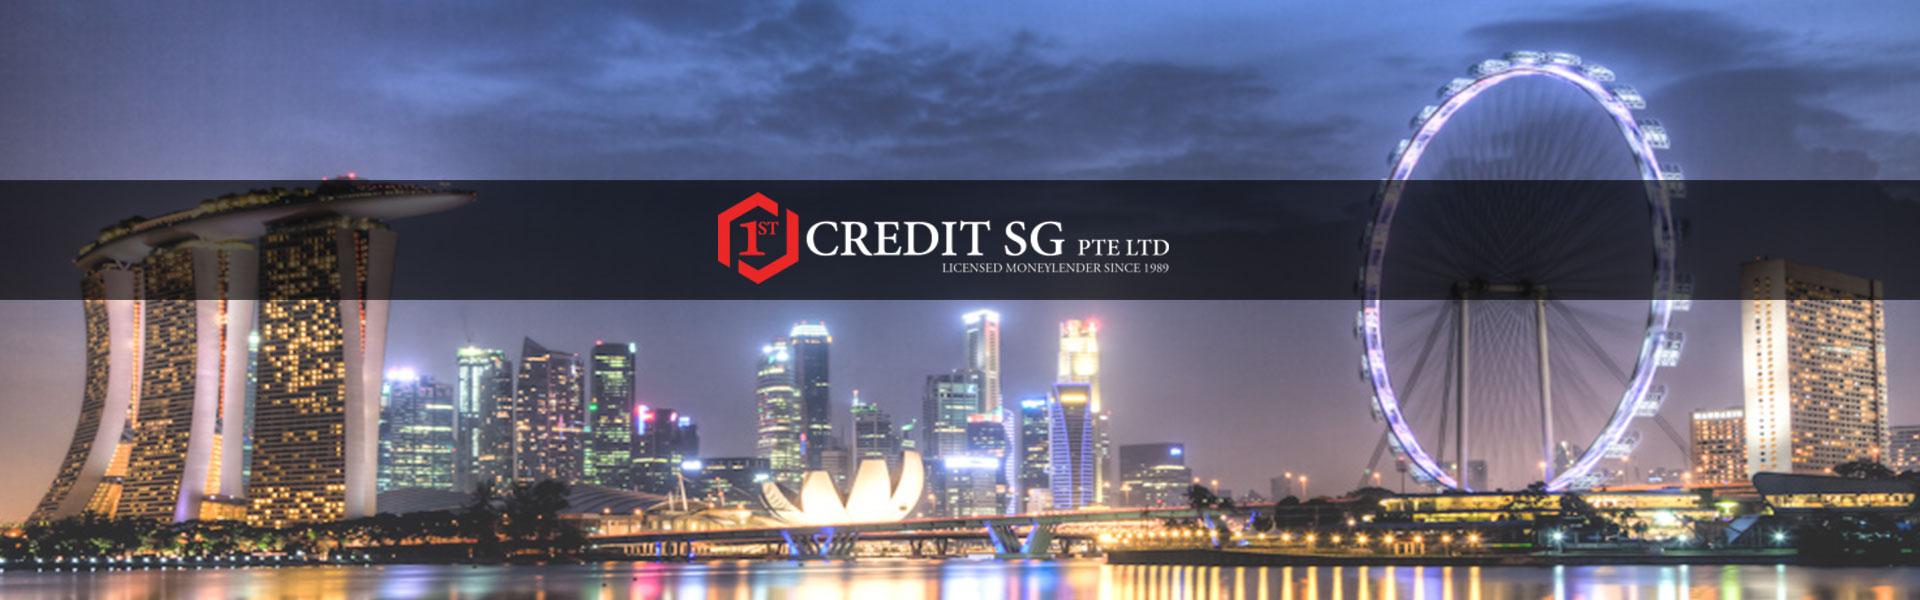 withlogo 1st-credit-sg-pte-ltd